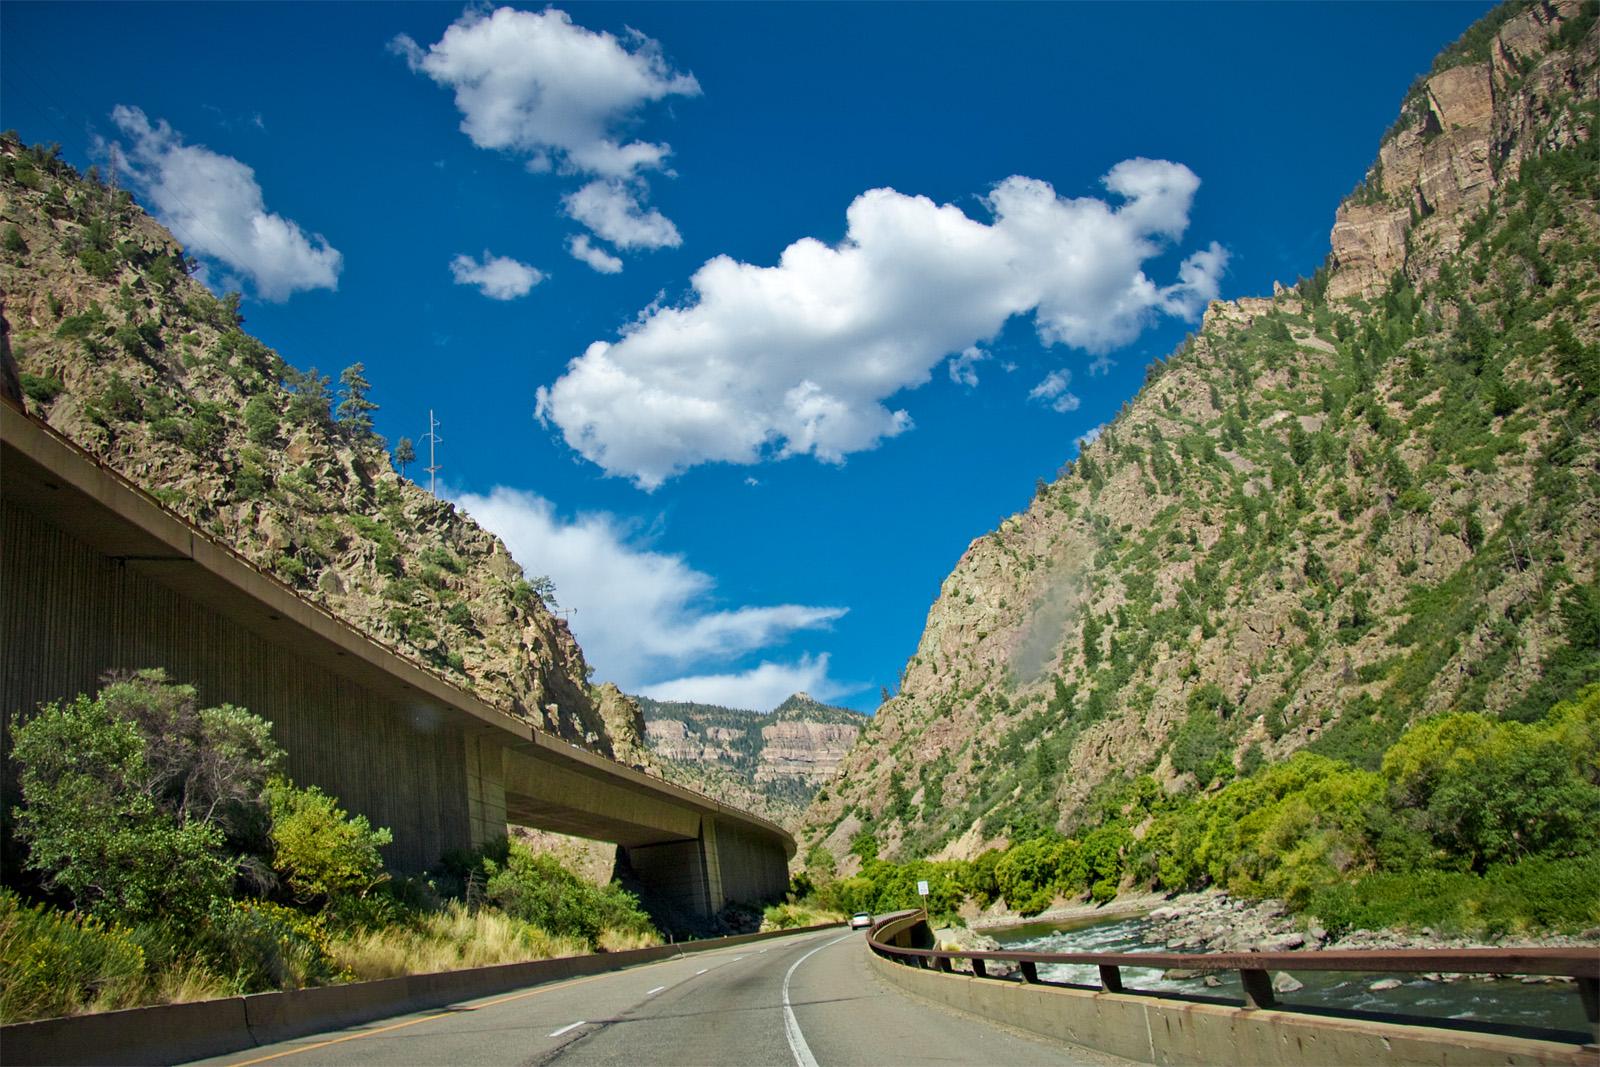 I-70_Glenwood_Canyon-terabass.jpg